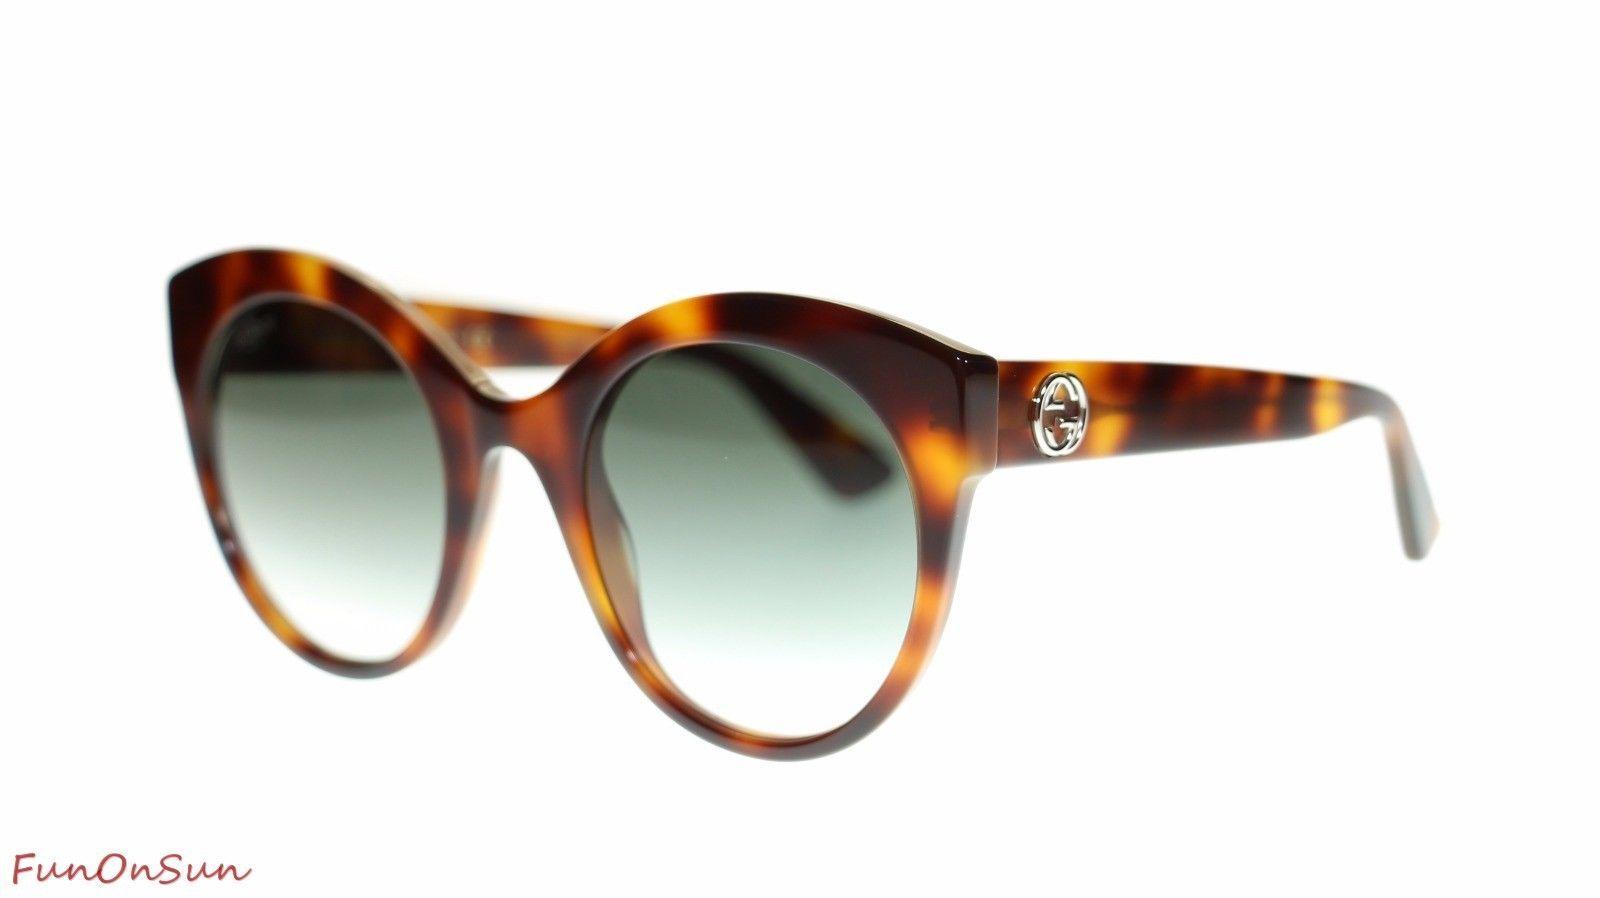 29c0cff31f S l1600. S l1600. Previous. Gucci Women Round Sunglasses GG0028S 002 Havana Green  Lens 52mm Authentic